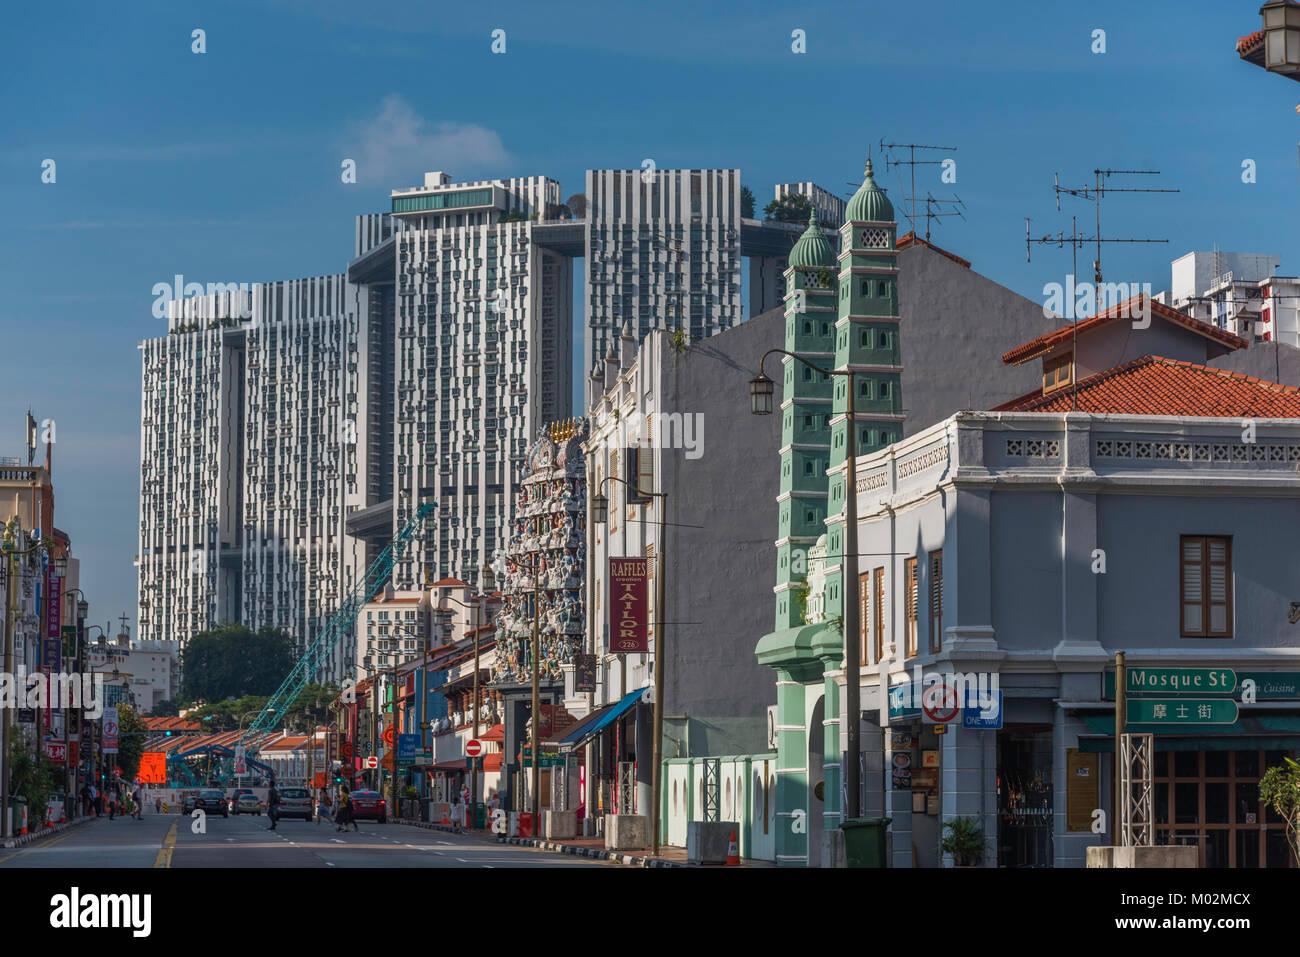 South Bridge Road, Chinatown, Singapore - Stock Image